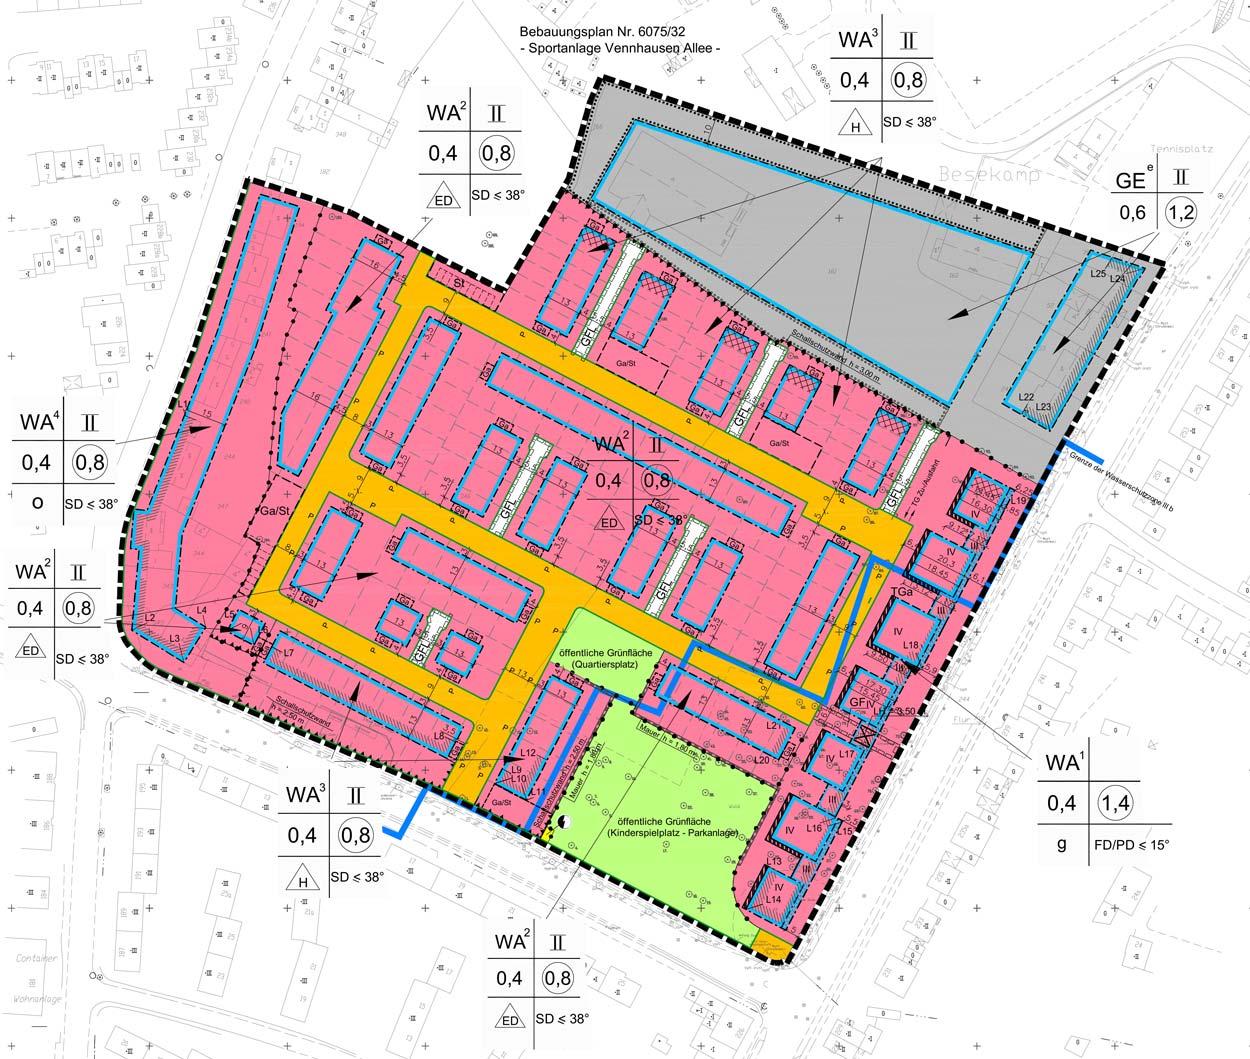 B-Plan Wohngebiet Veenpark Düsseldorf-Vennhausen Planquadrat Dortmund